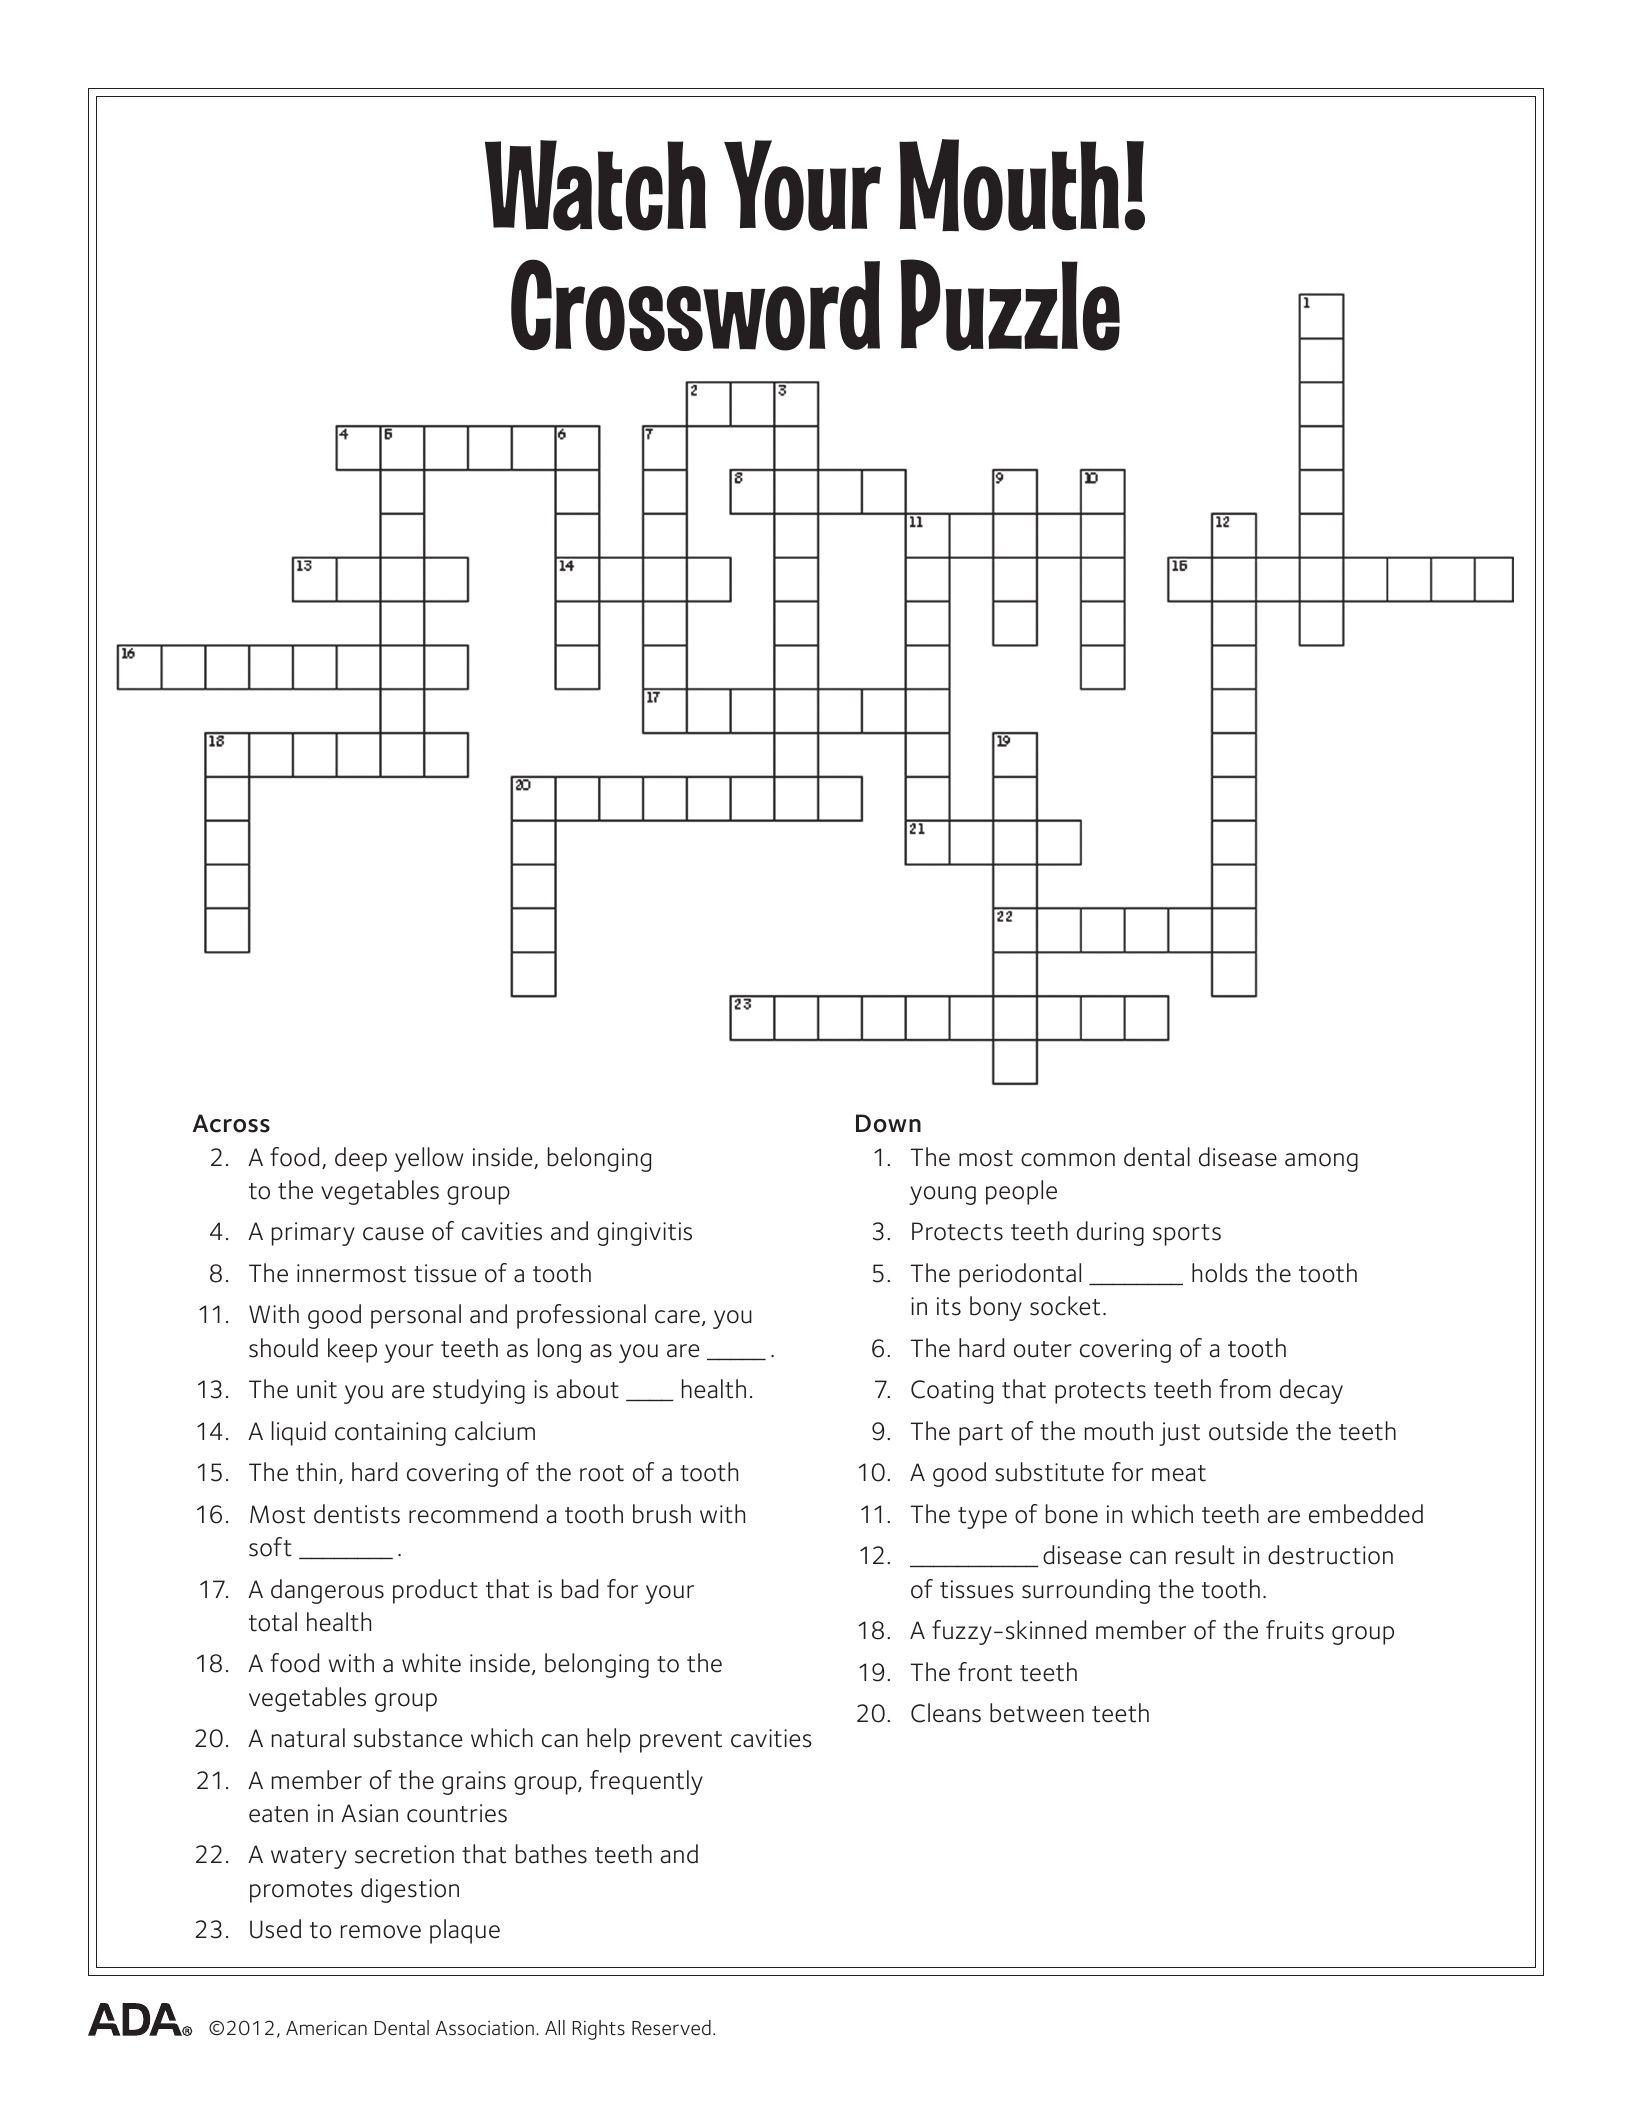 11 Dental Health Activities Puzzle Fun (Printable) | Dental Hygiene - Printable Mental Health Crossword Puzzle